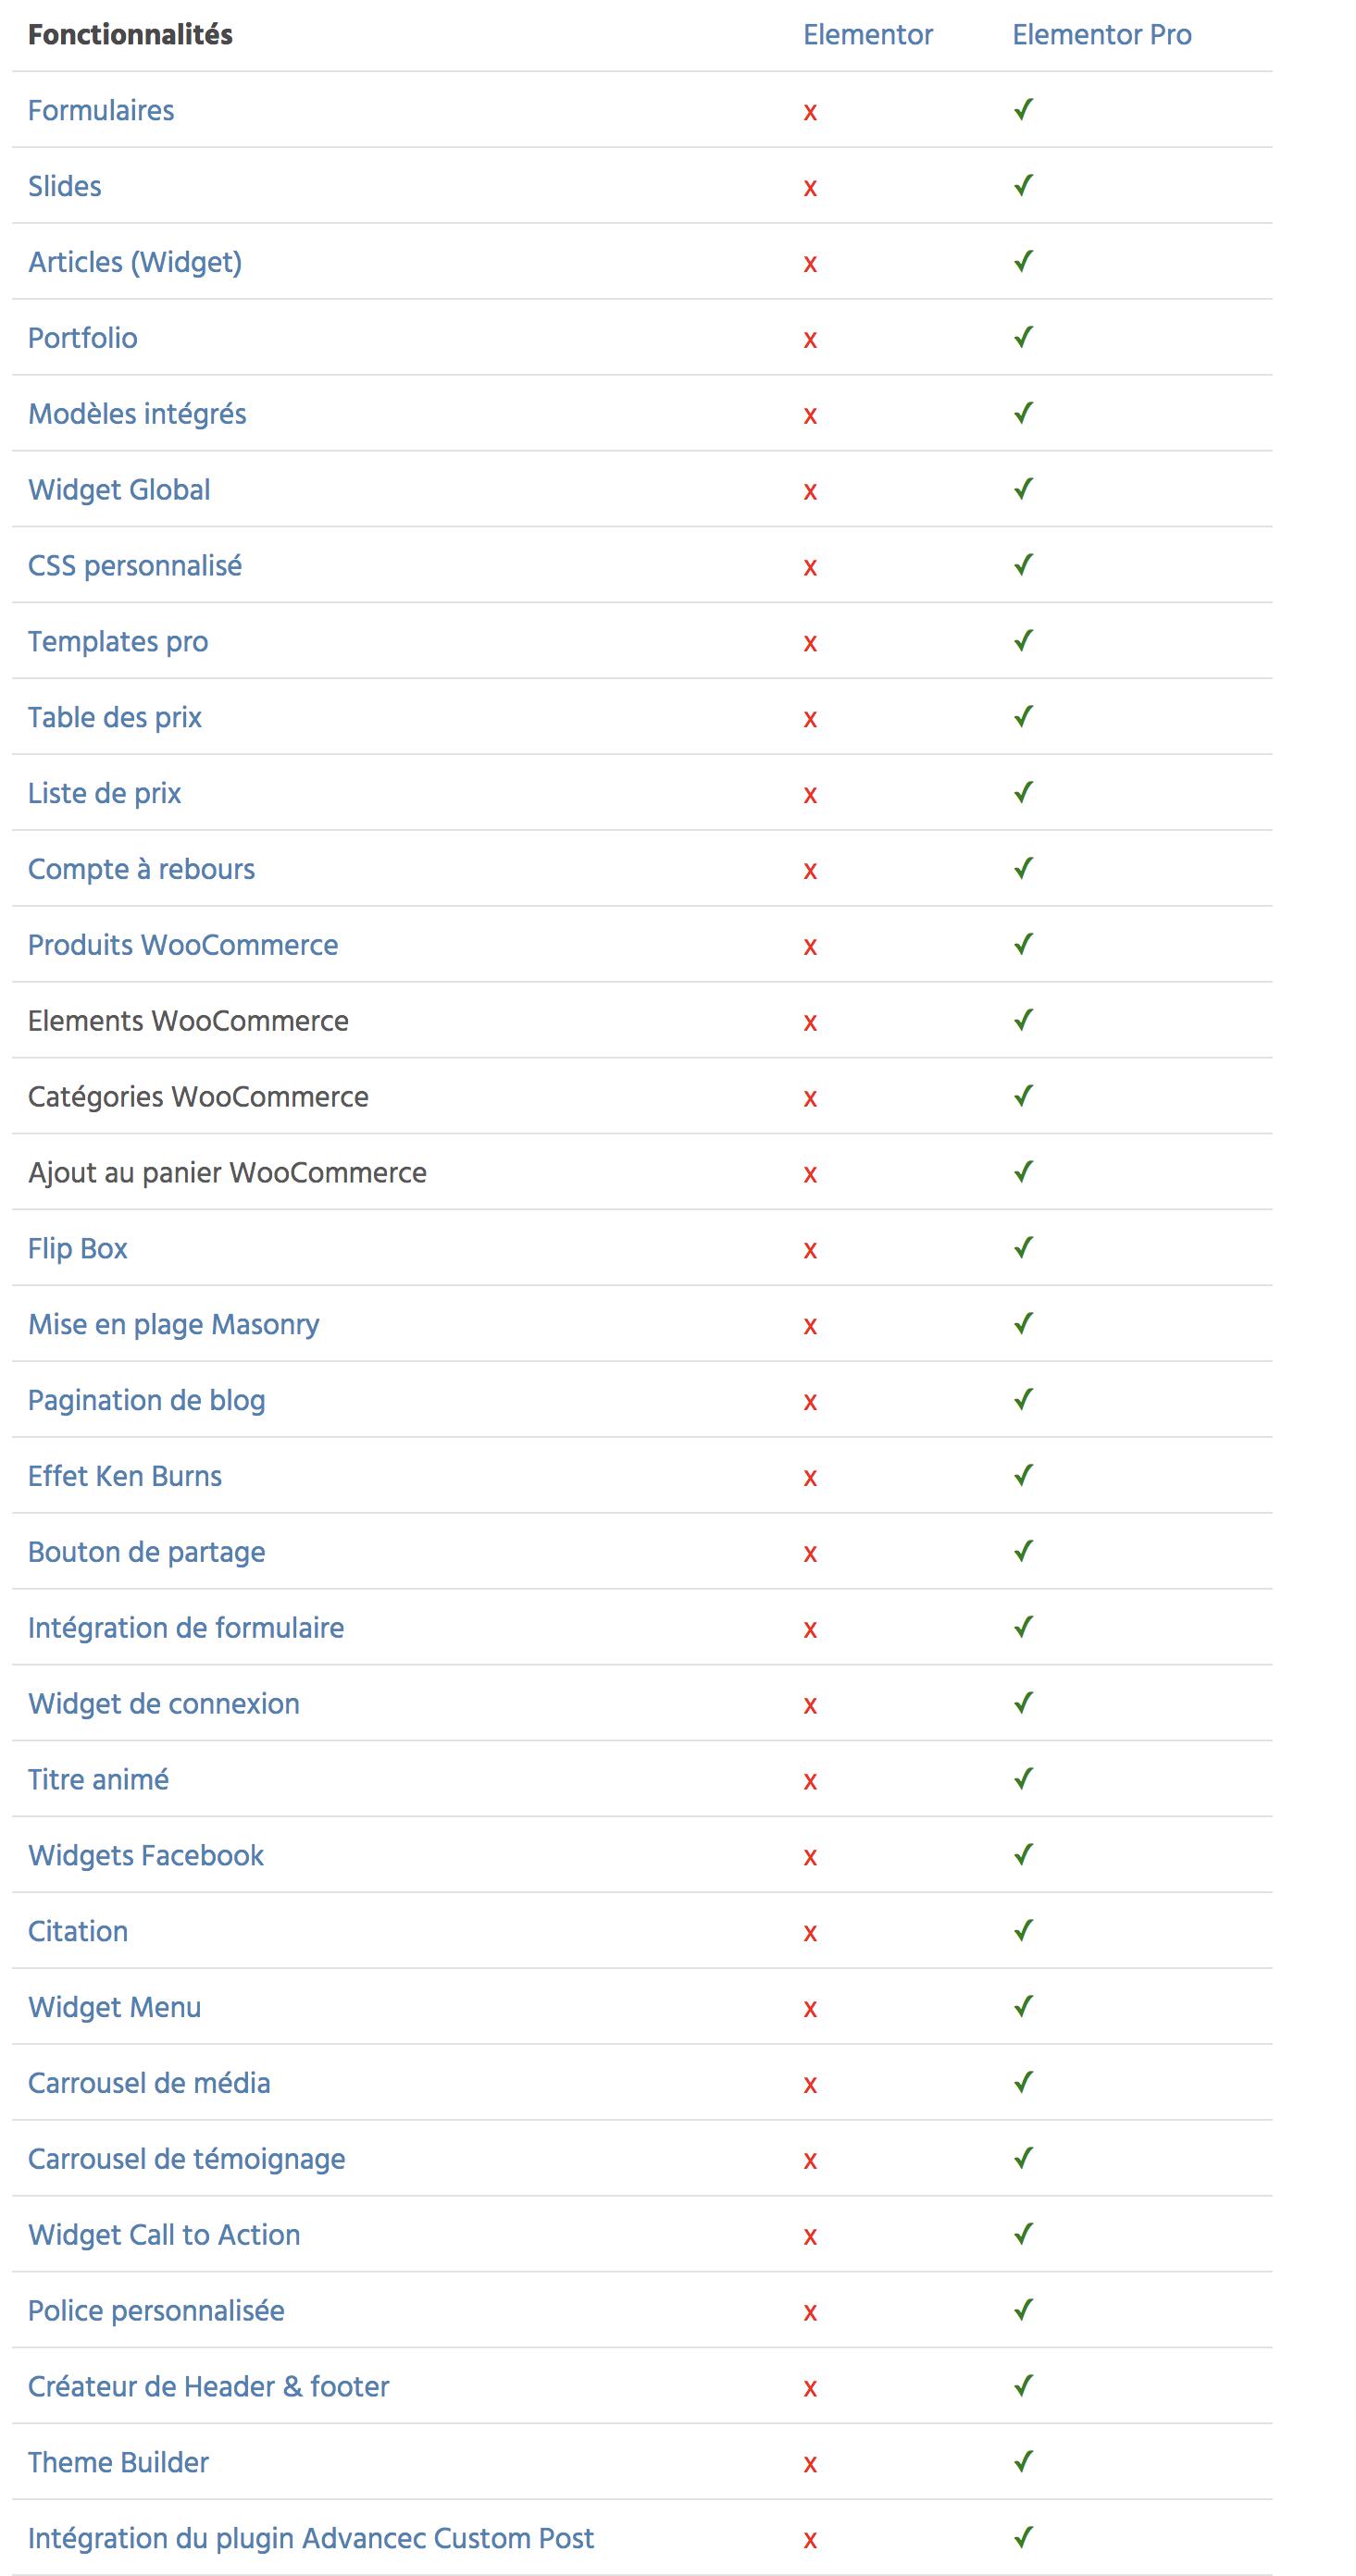 elementor-pro-options